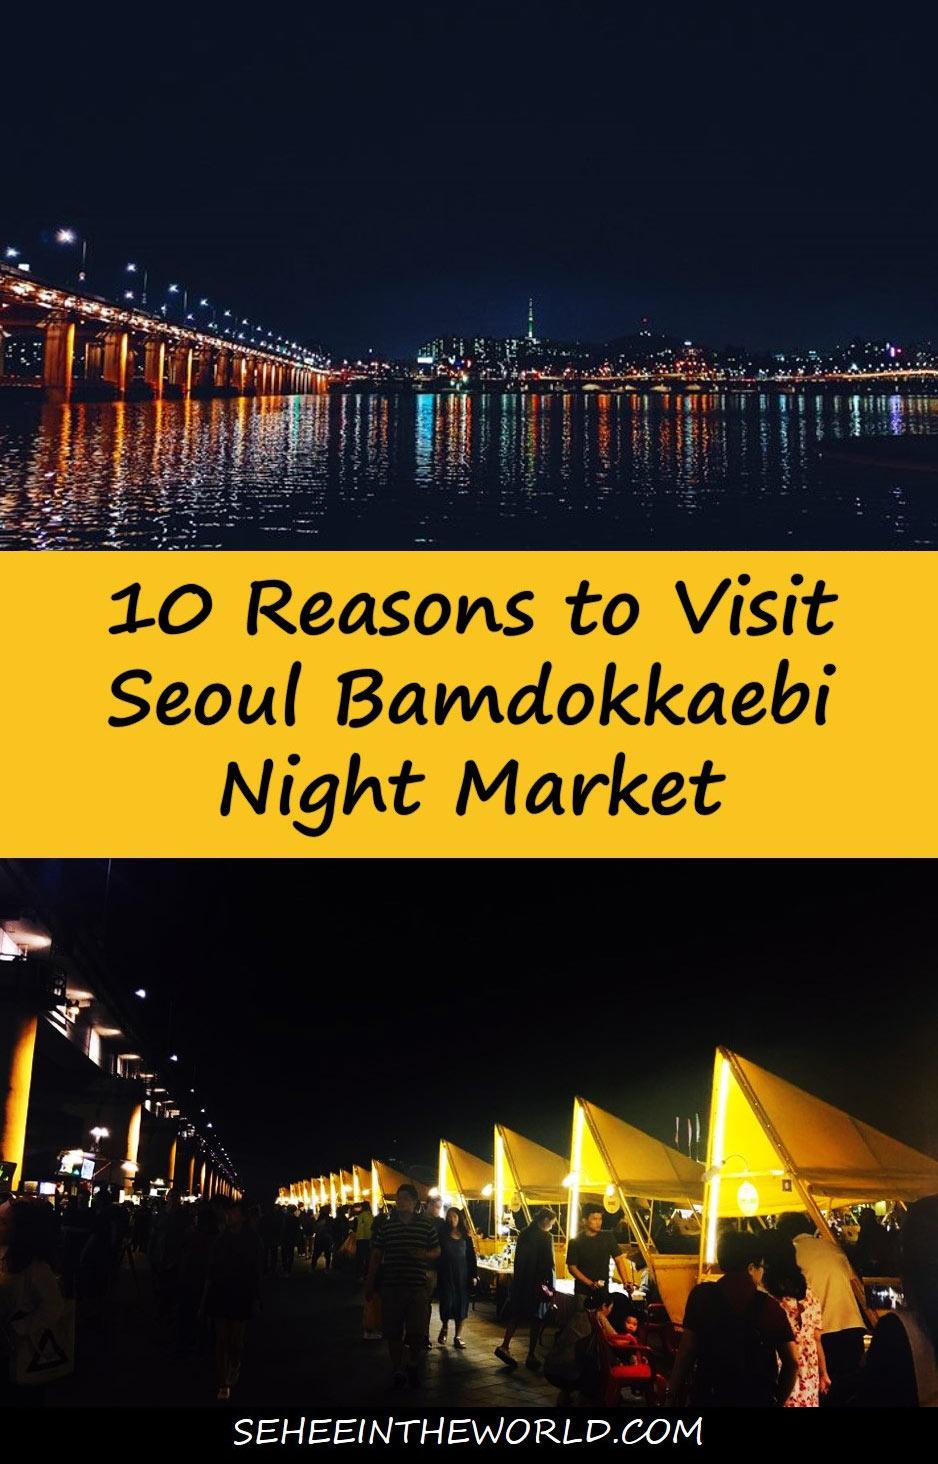 10 Reasons to Visit Seoul Bamdokkaebi Night Market - Sehee in the World - Pinterest